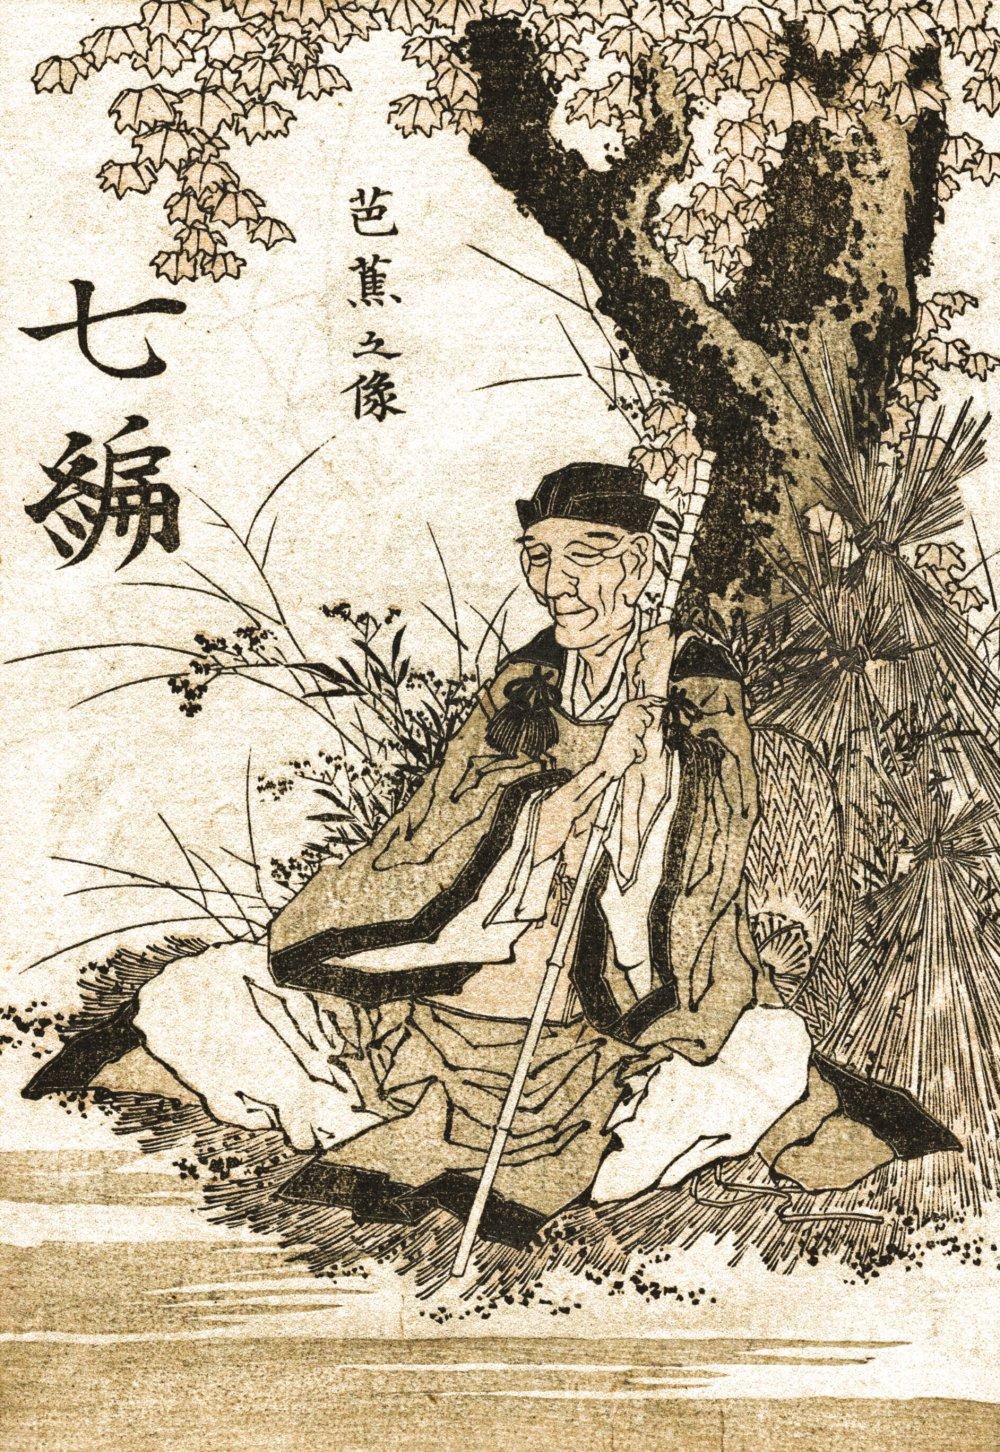 http://uploads4.wikipaintings.org/images/katsushika-hokusai/portrait-of-matsuo-basho.jpg